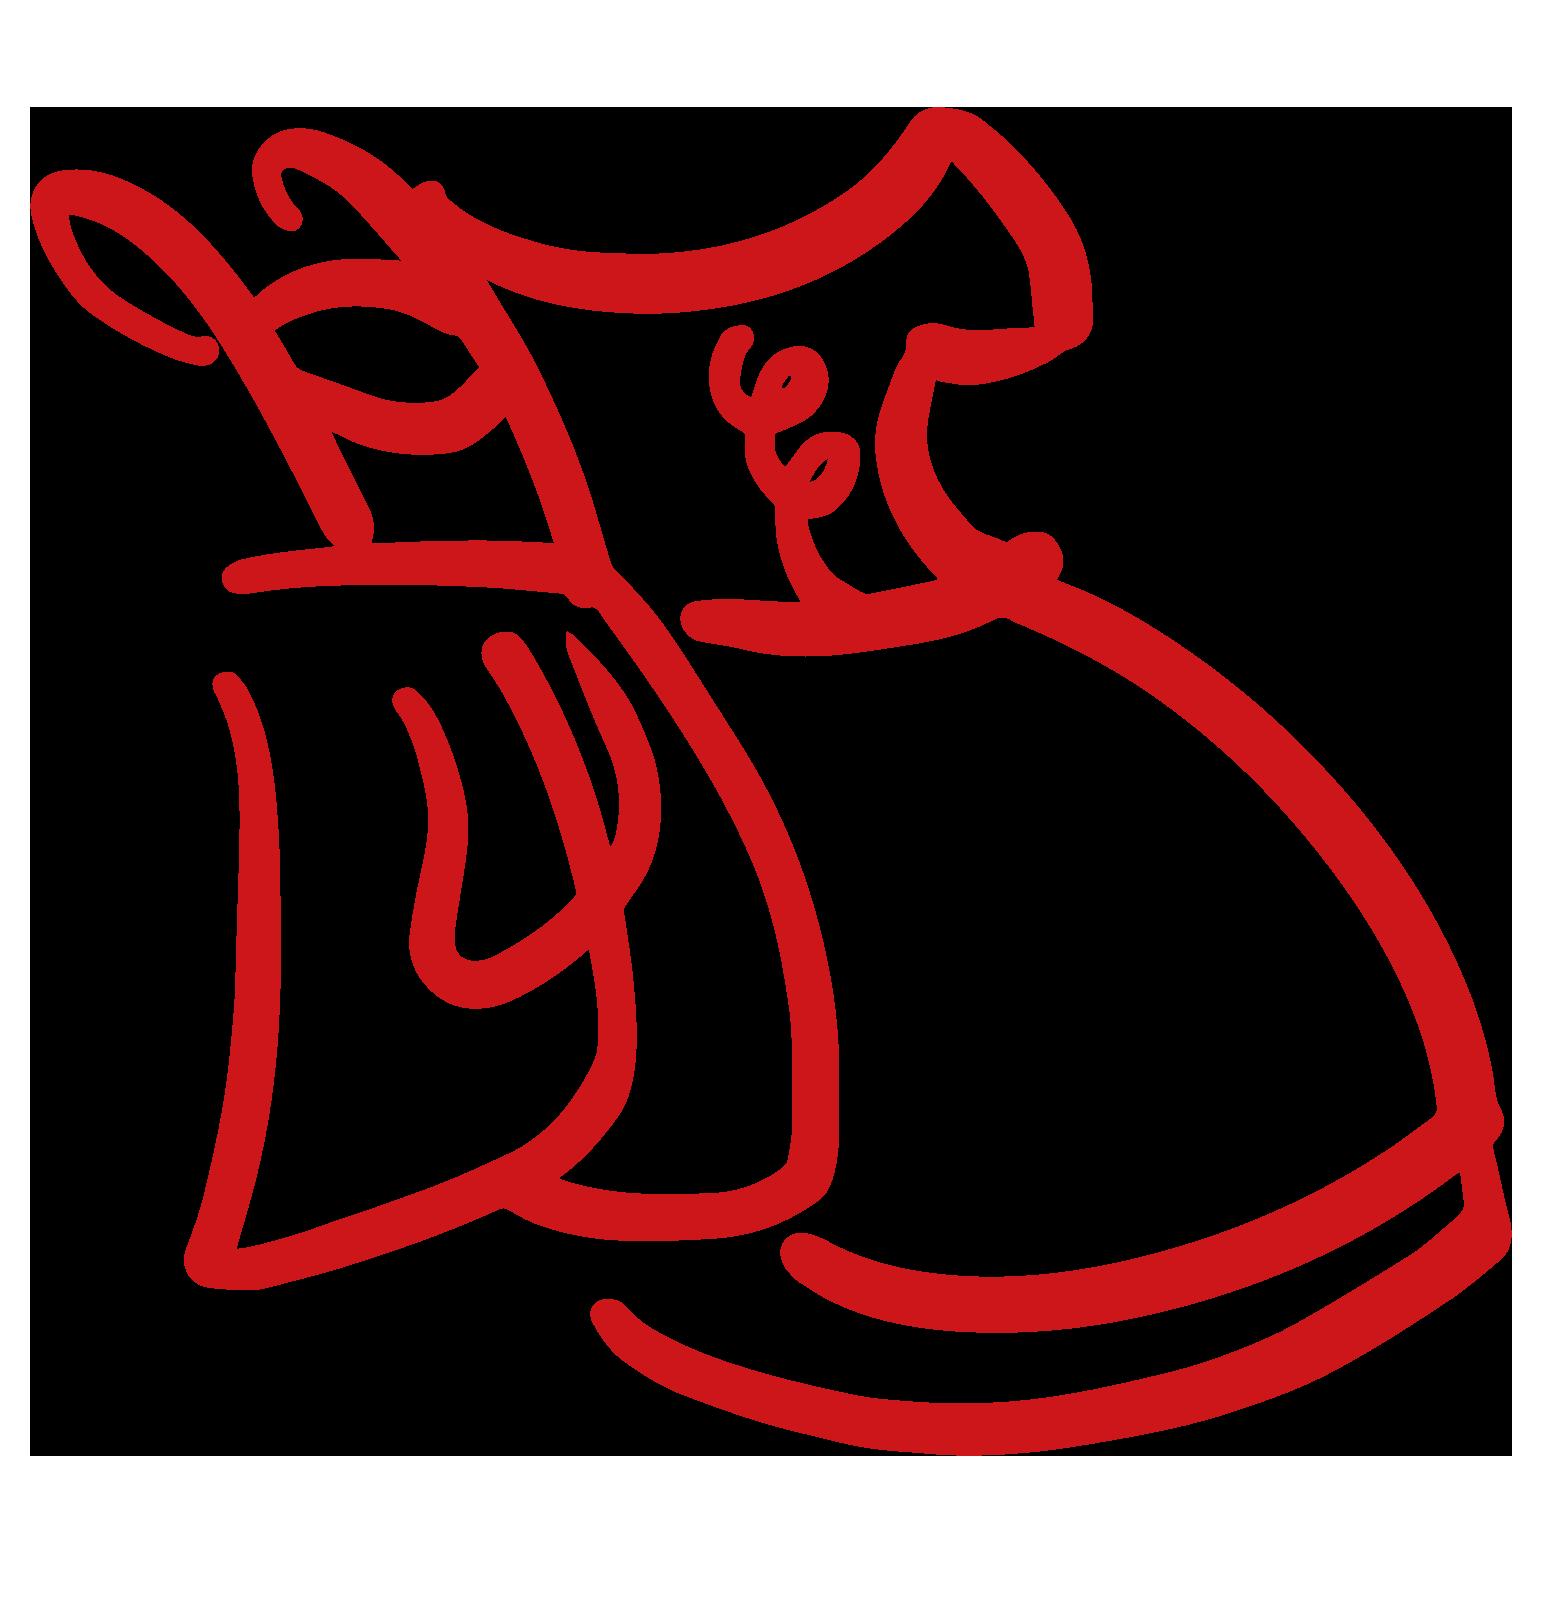 Kurzer Trachtenrock, oliv-rosa, im Petticoat Stil